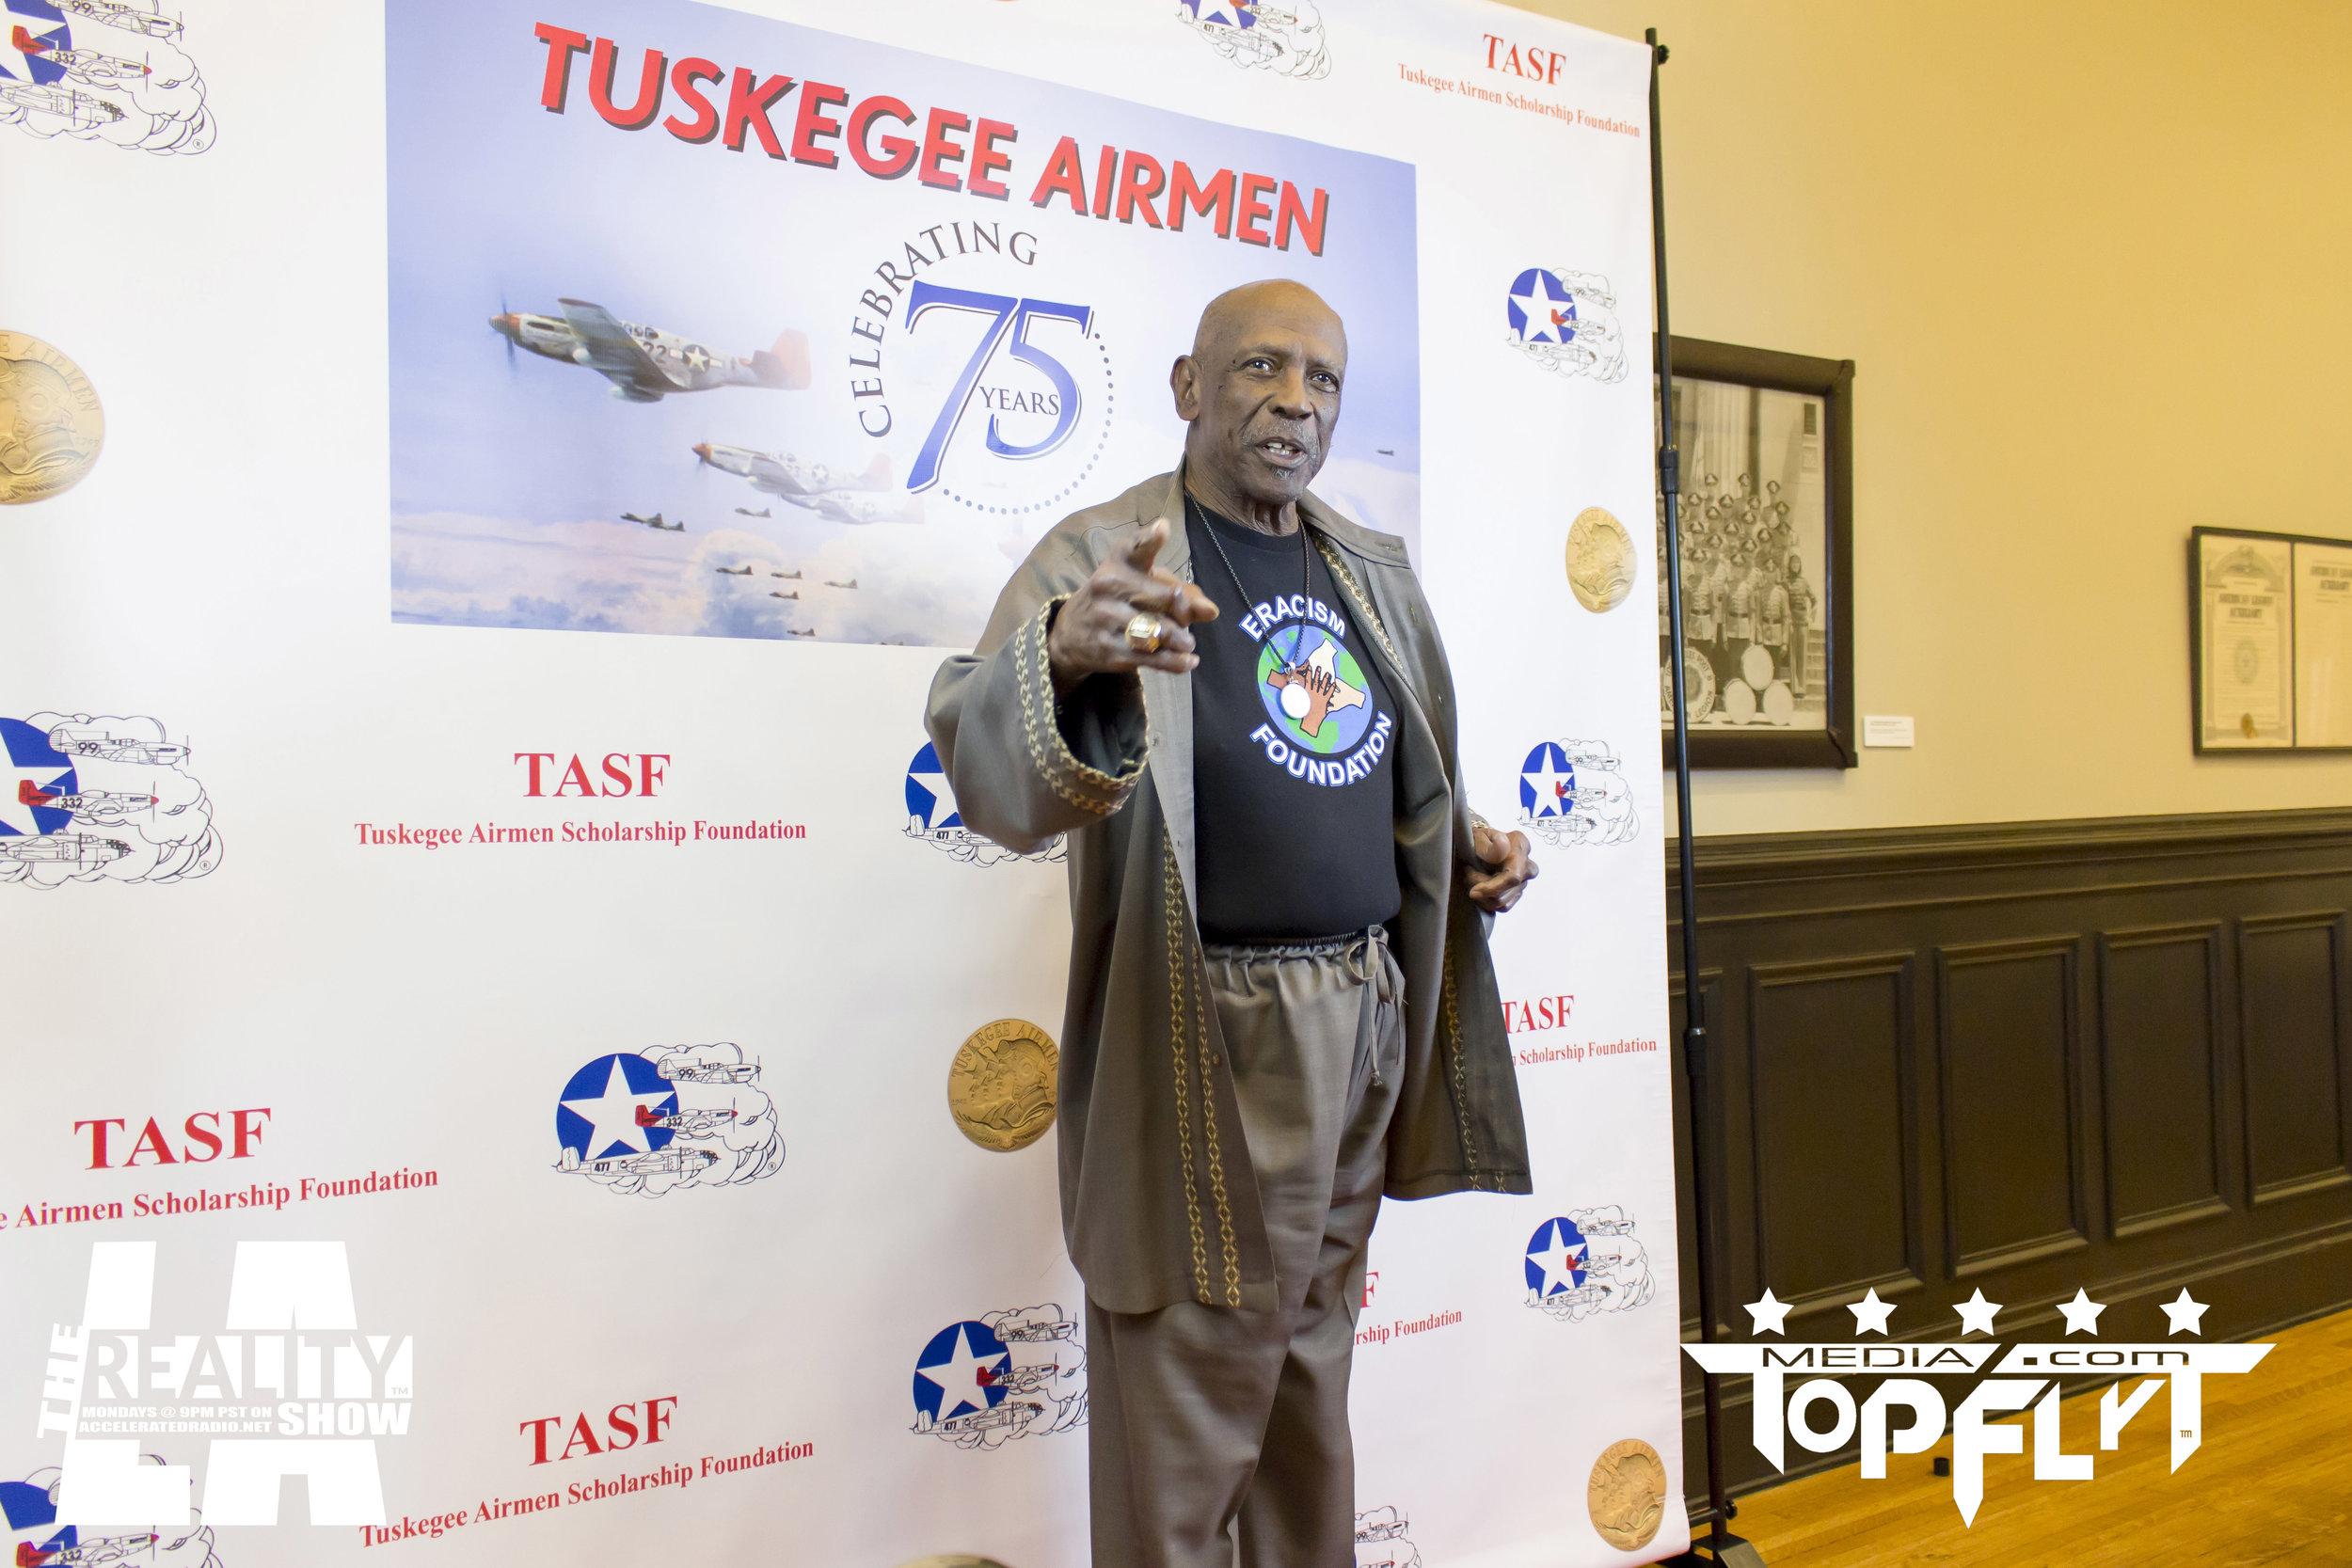 The Reality Show LA - Tuskegee Airmen 75th Anniversary VIP Reception_152.jpg